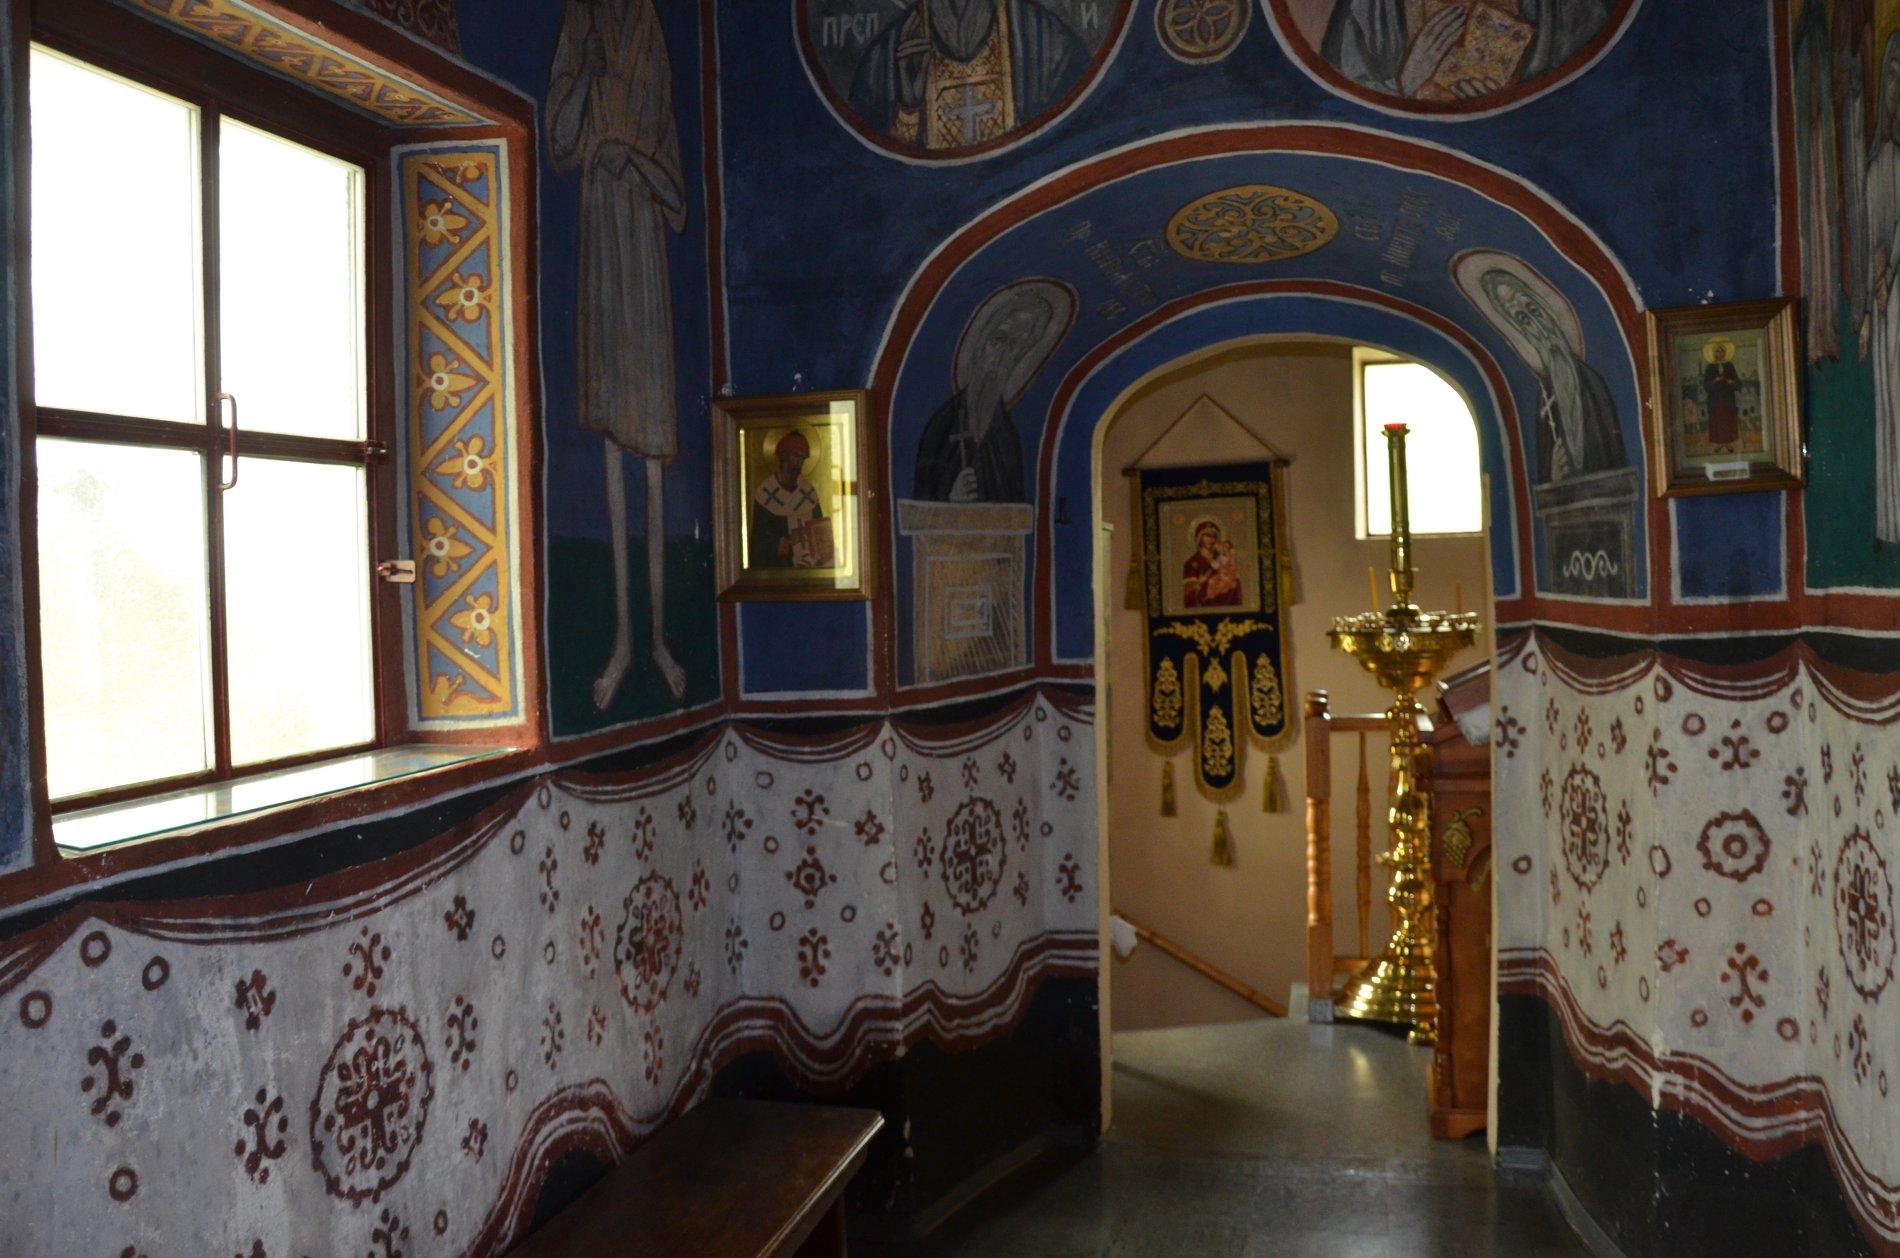 Russisch Orthodoxe Kirche1 Seitengang innen